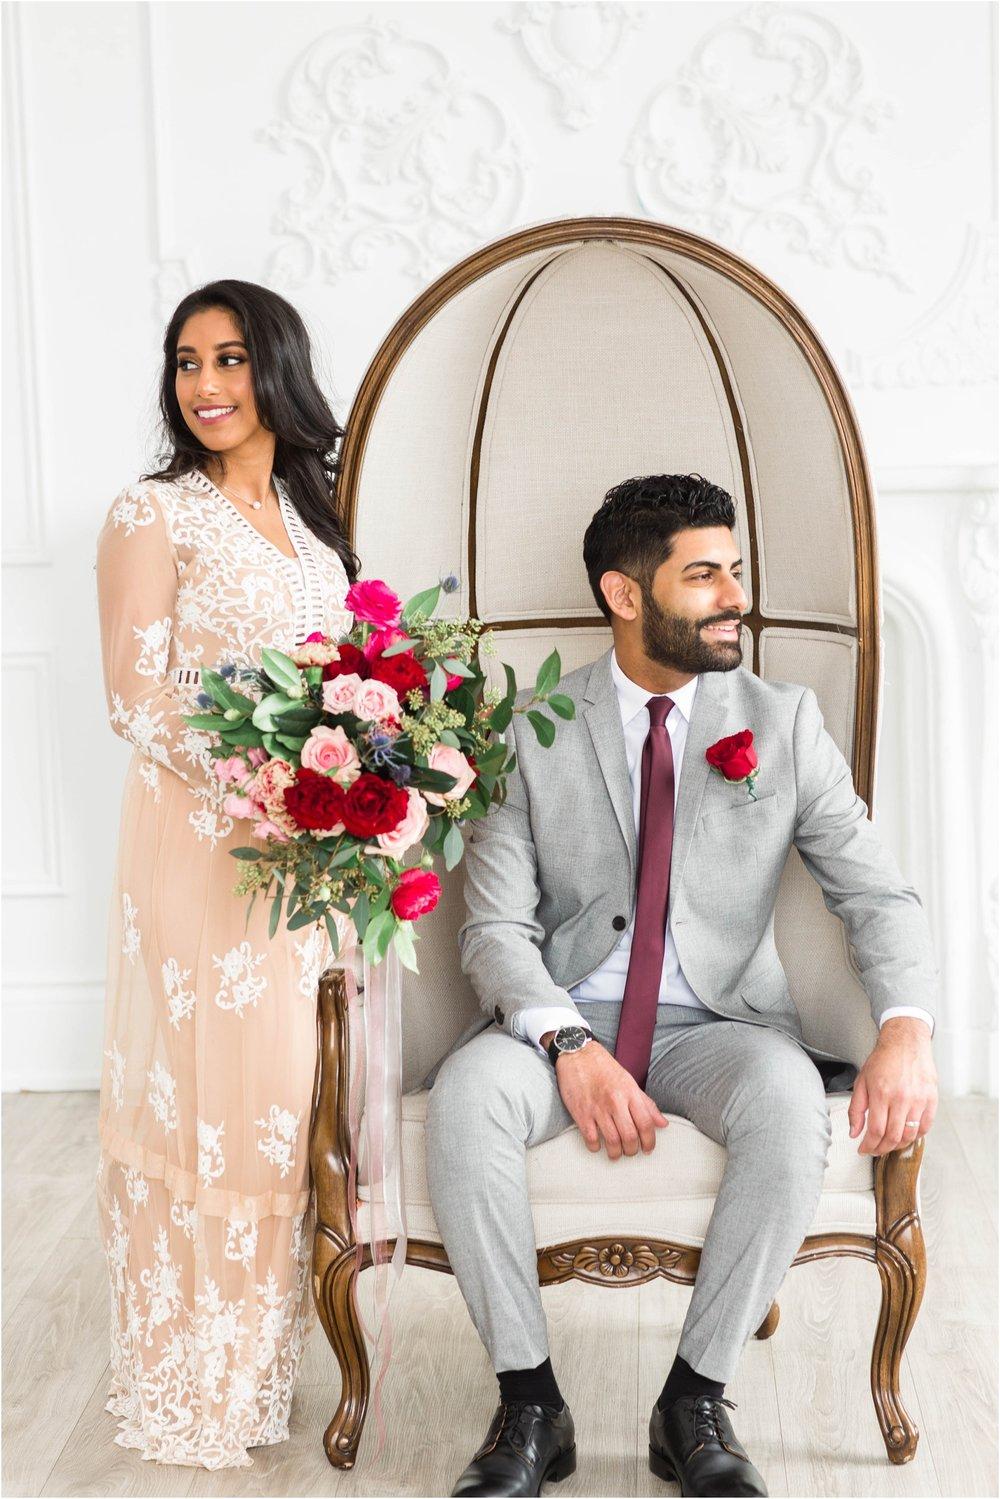 Mint-Room-Studios-Anniversary-Session-Toronto-Mississauga-Brampton-Scarborough-GTA-Pakistani-Indian-Wedding-Engagement-Photographer-Photography_0012.jpg